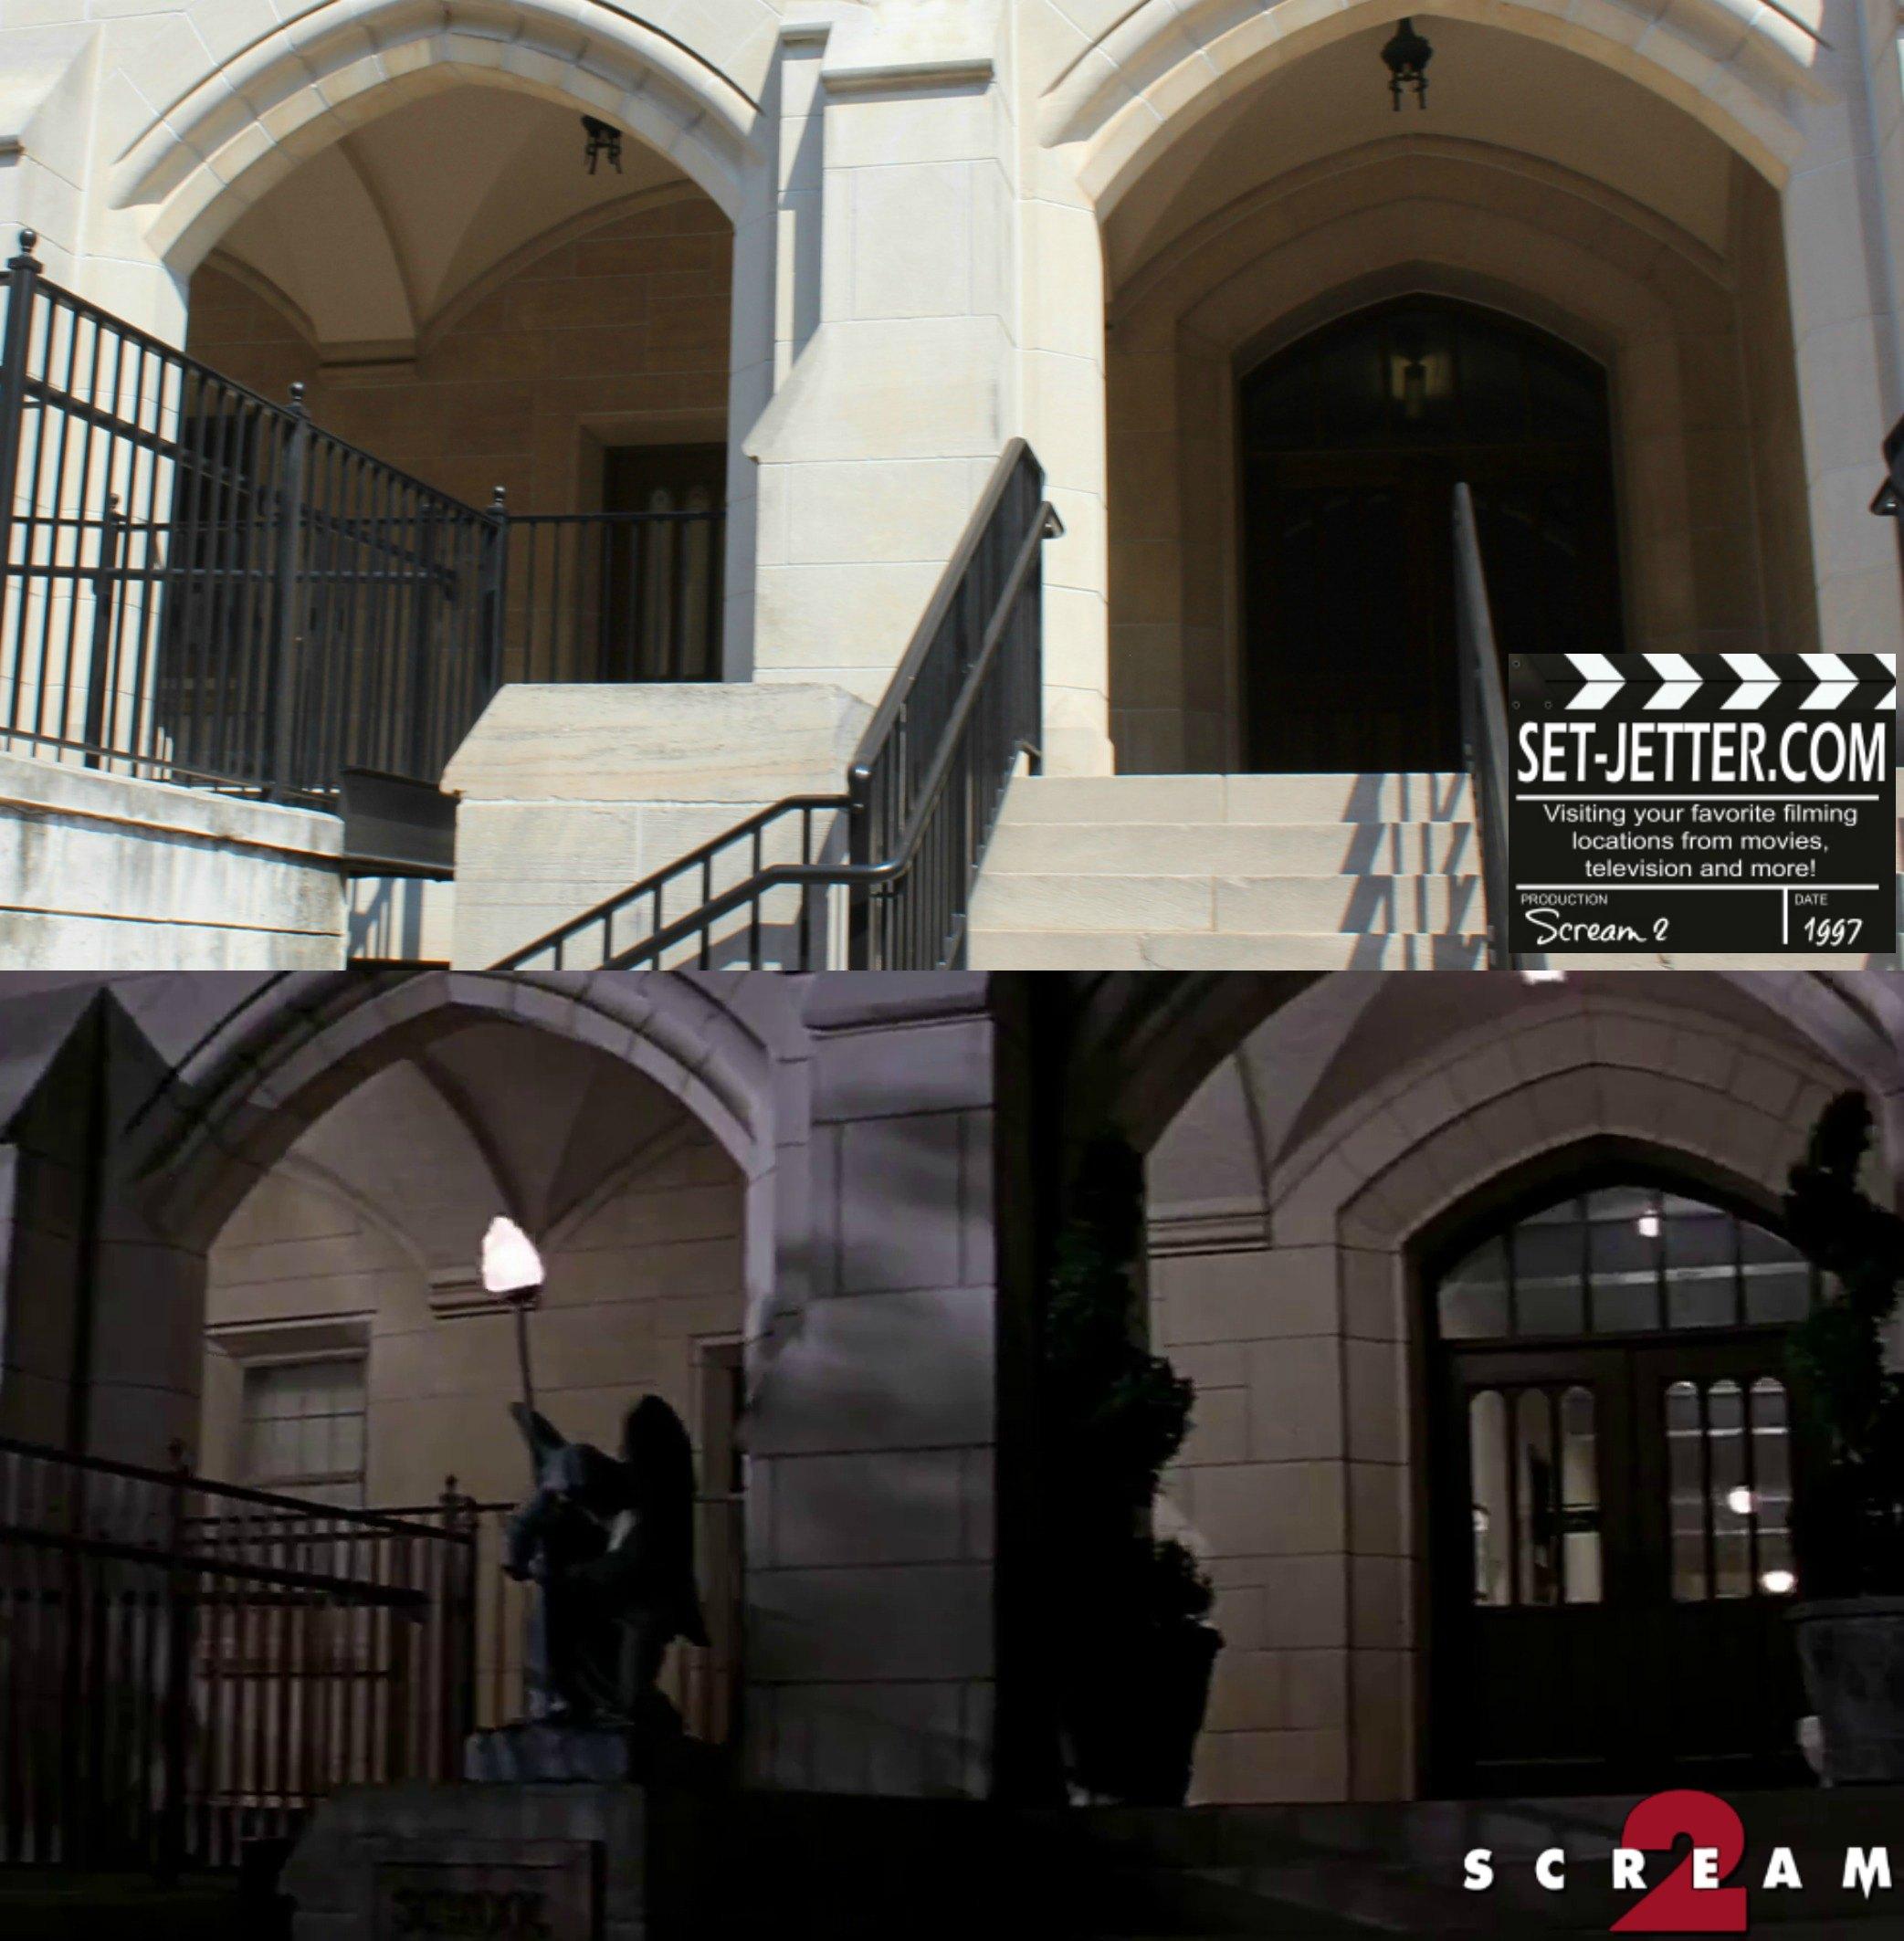 Scream 2 comparison 219.jpg